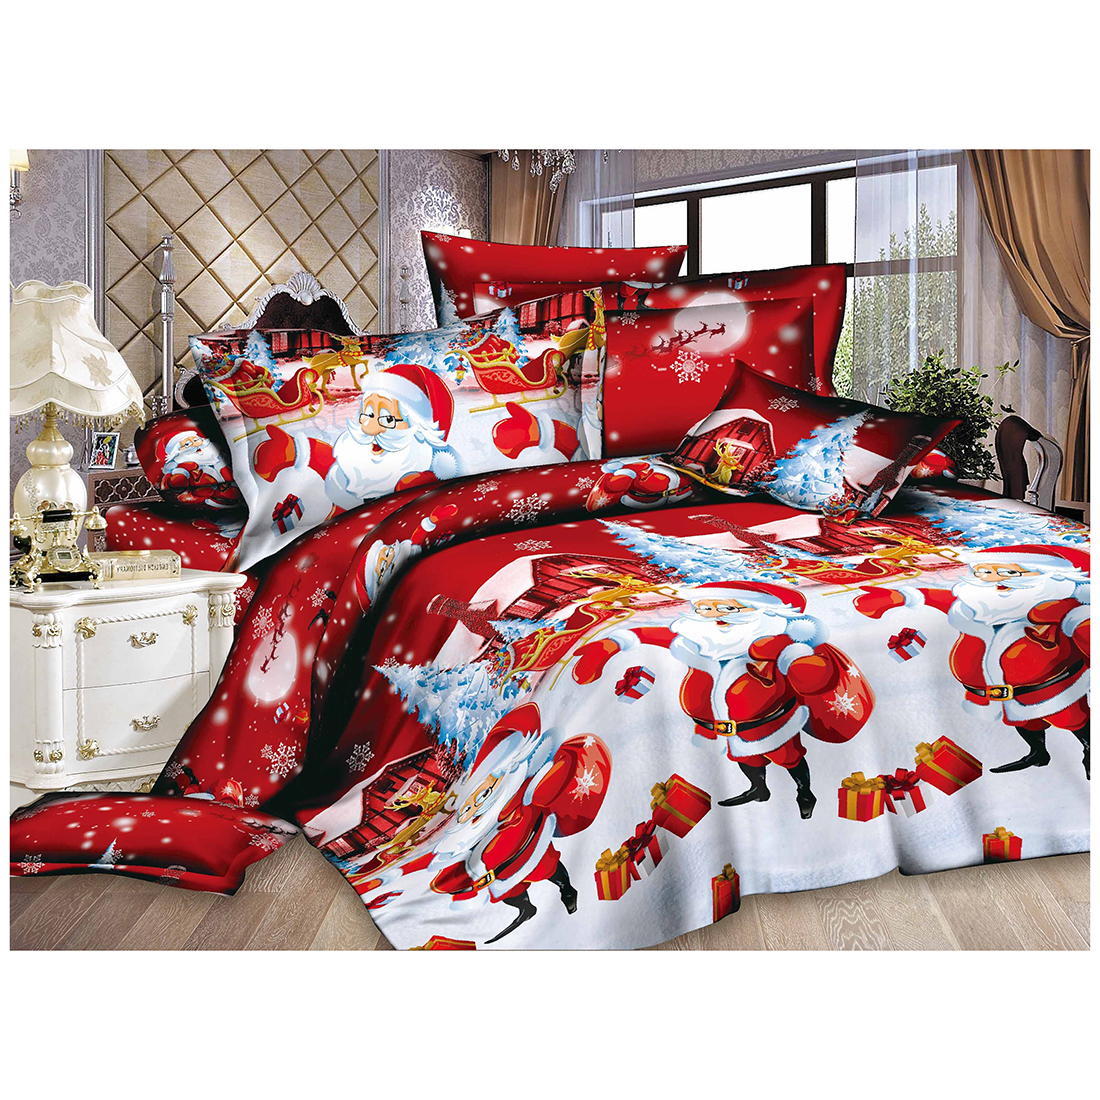 Christmas Home Textile Cotton Bedclothes High-quality 4pc Bedding Set